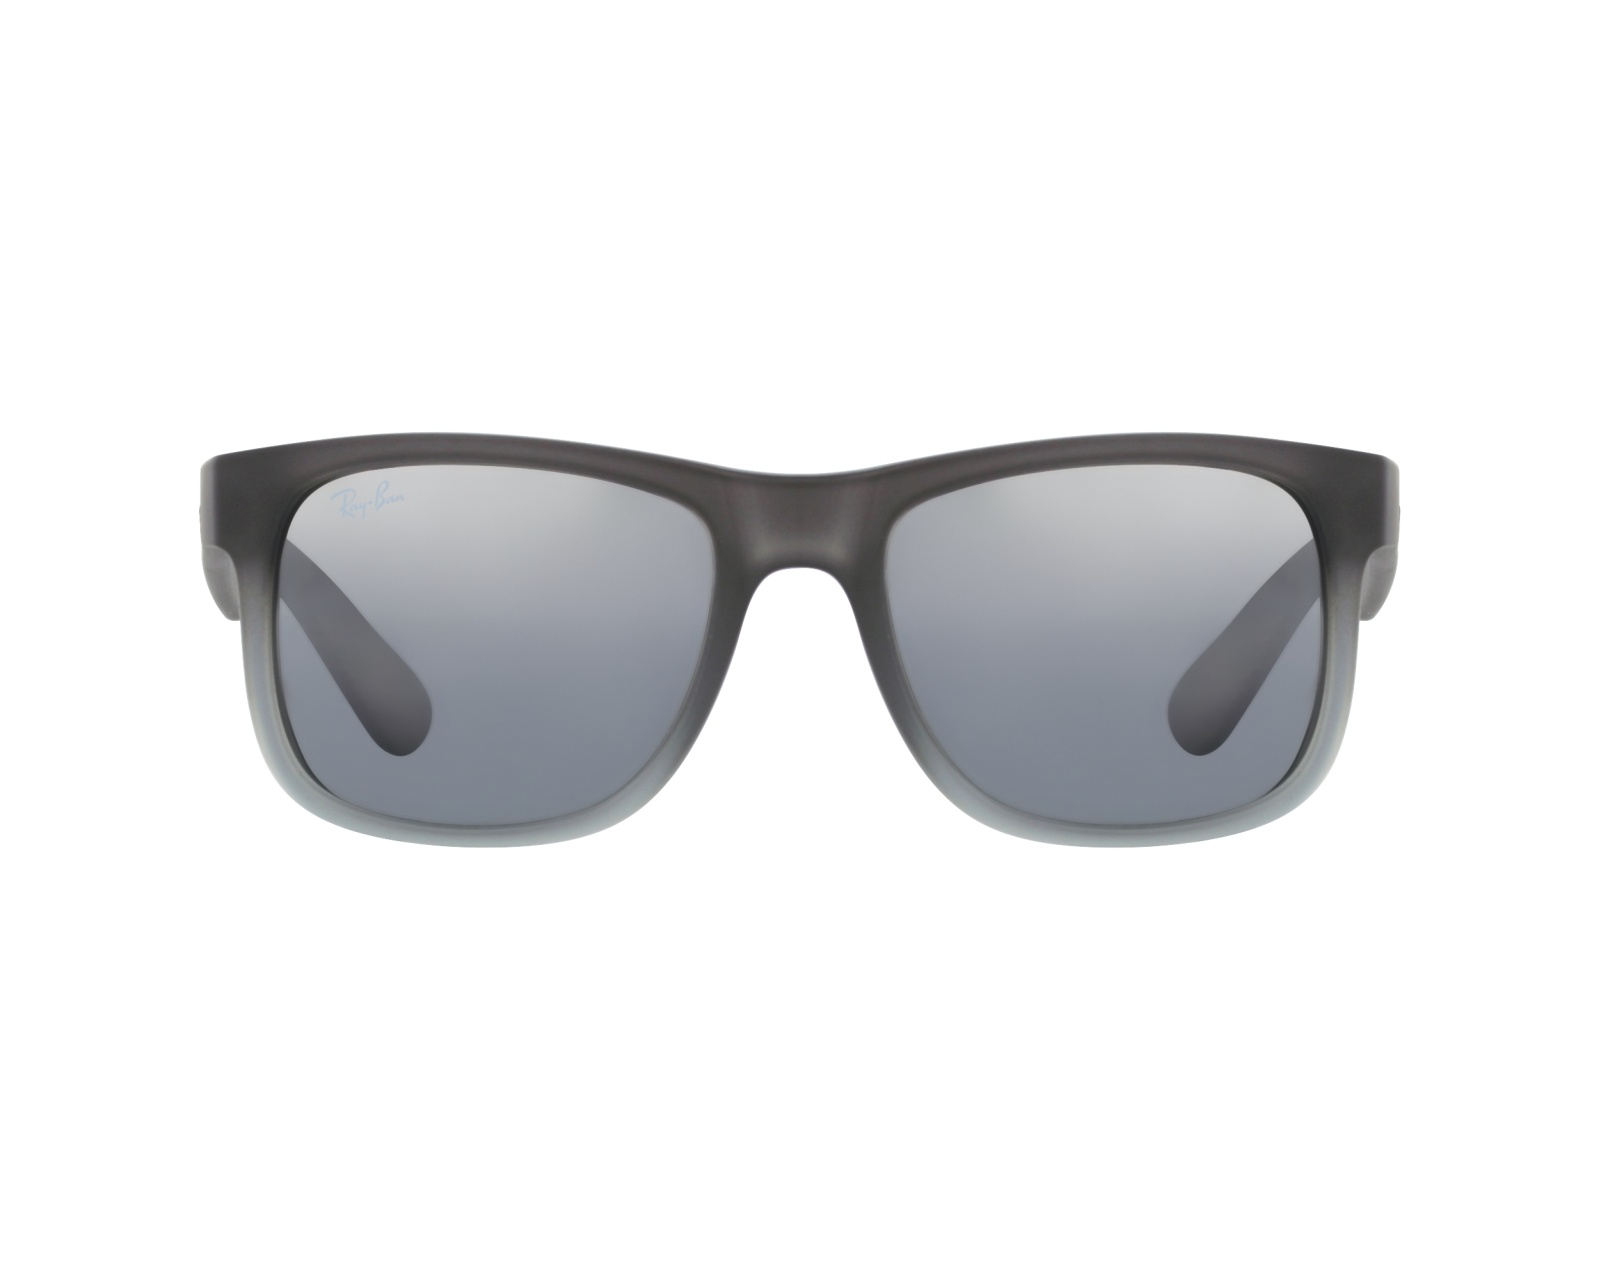 Sunglasses Ray-Ban RB-4165 852 88 51-15 Grey profile view ca365a44cc